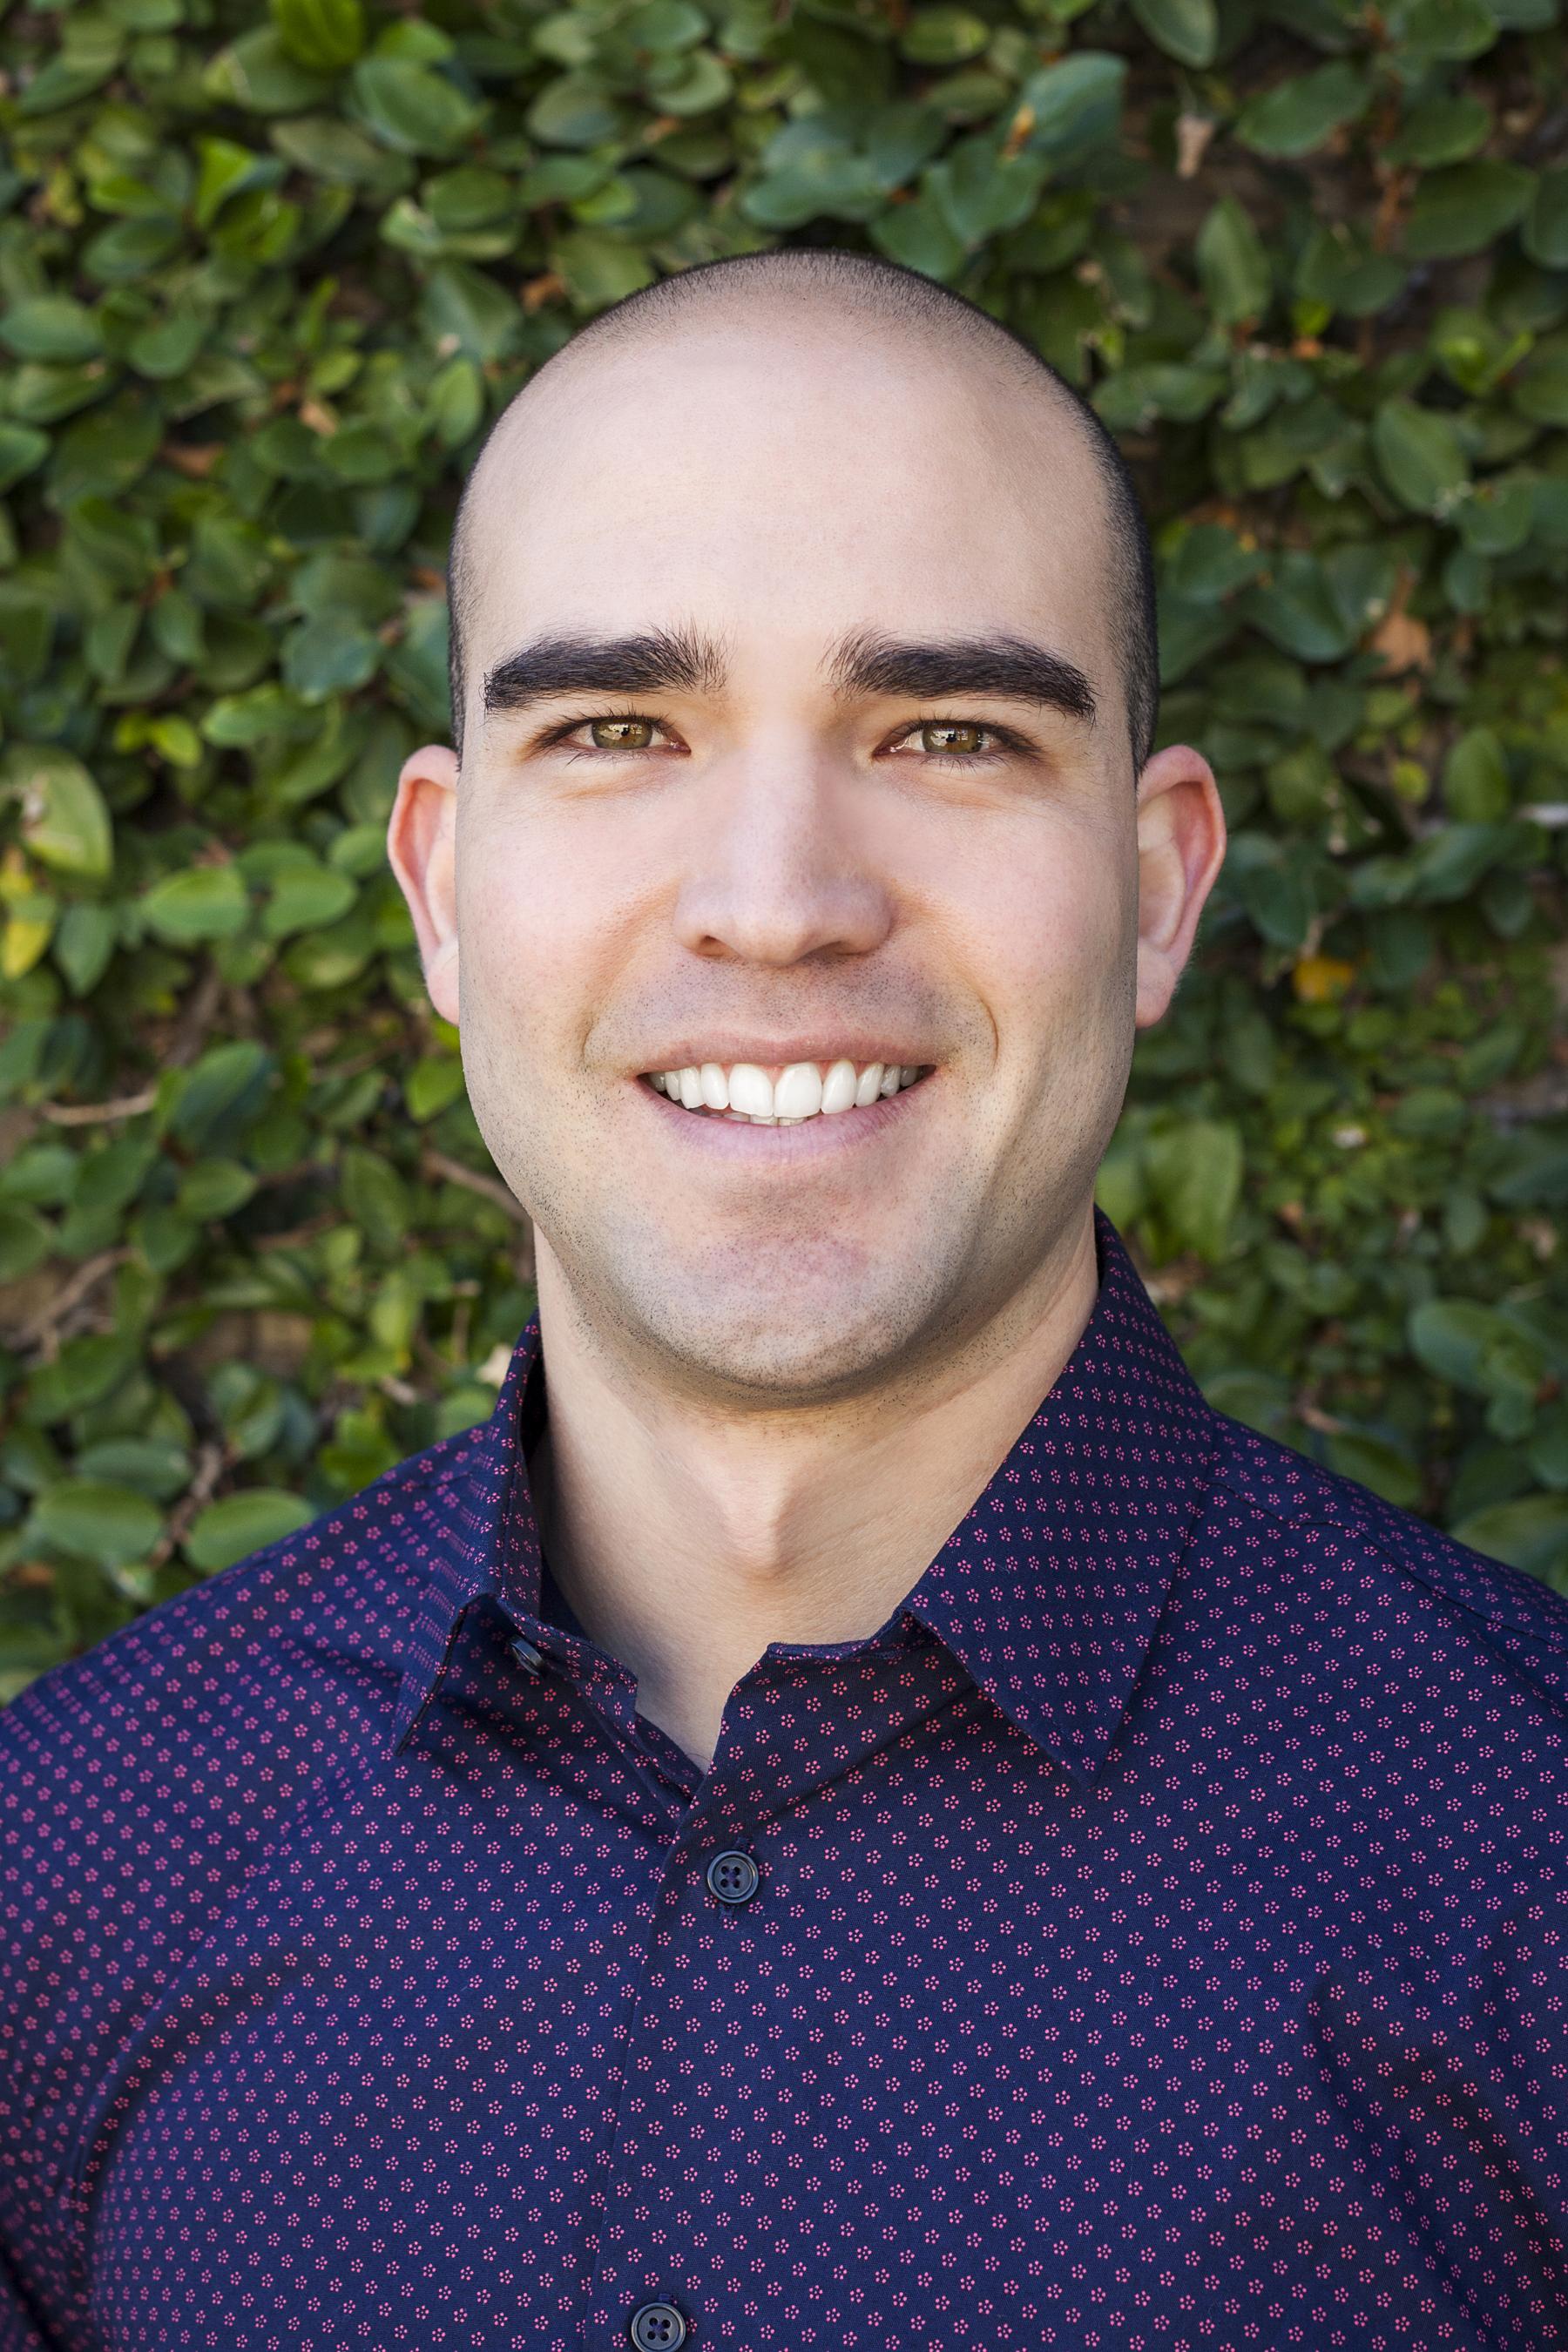 ELM Bernie D Portrait 1.jpg